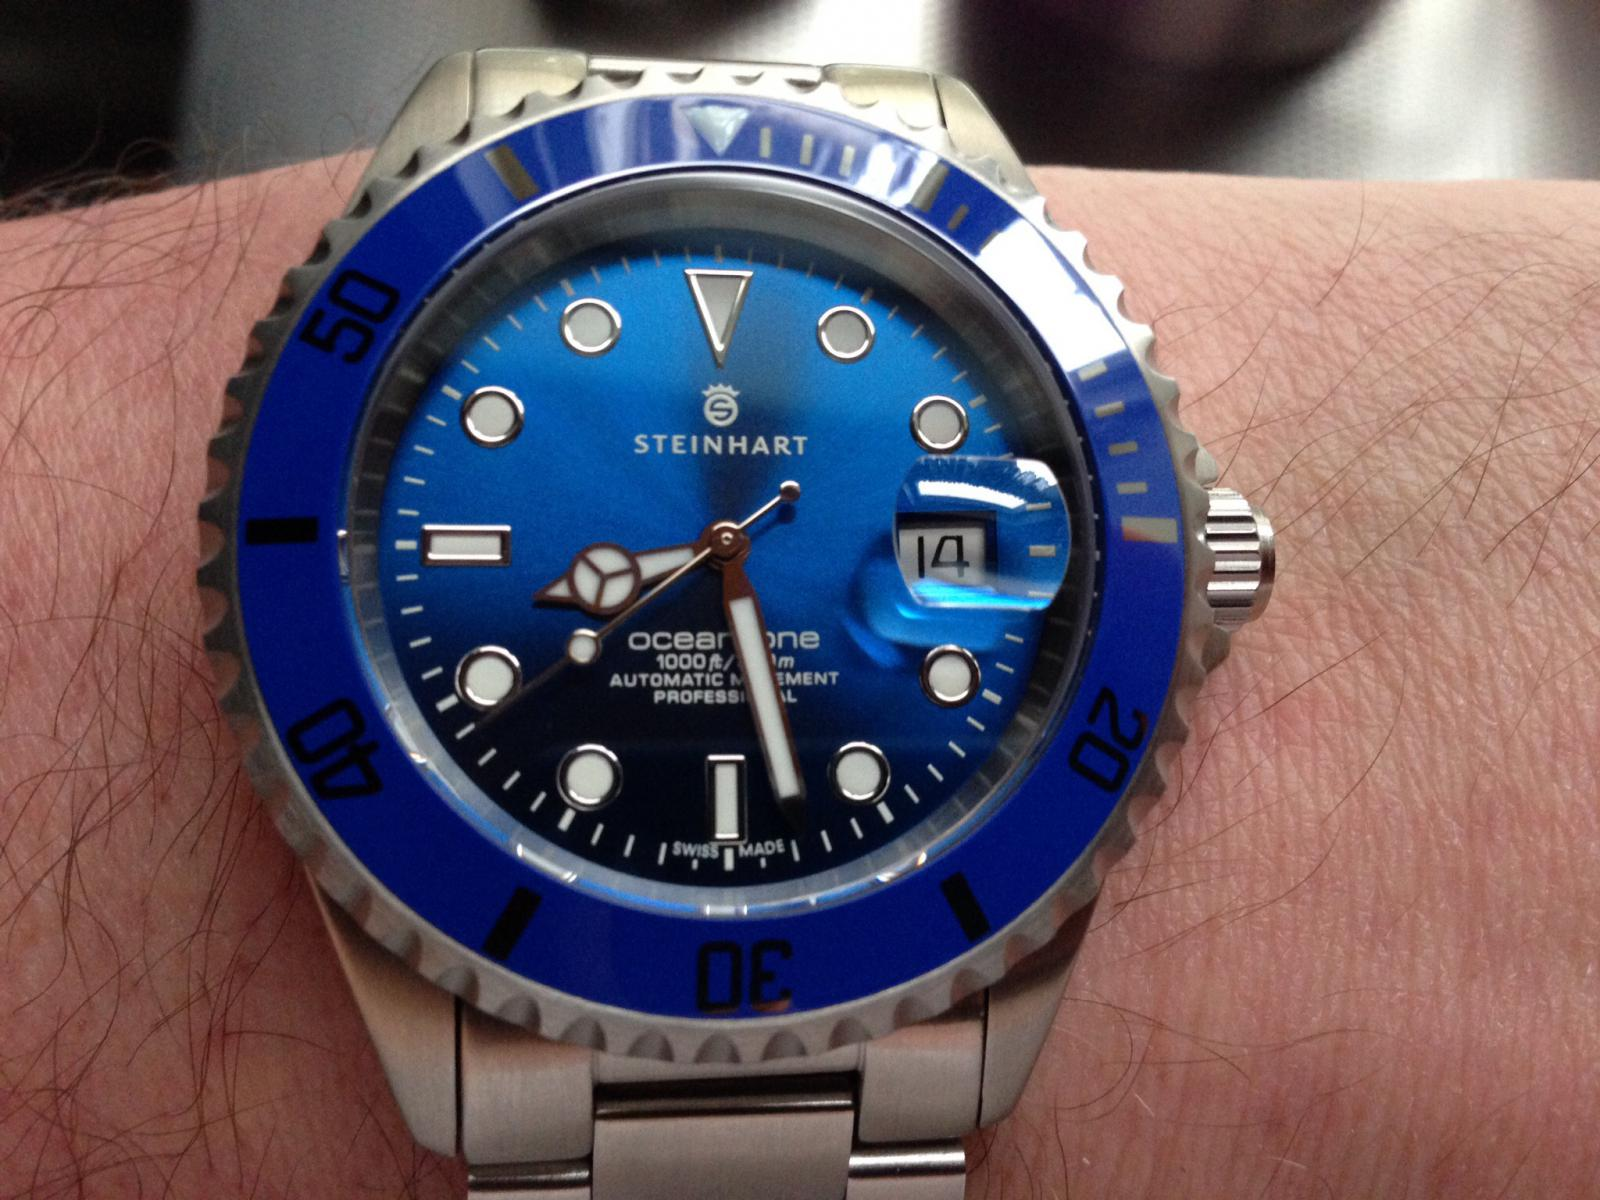 Steinhart Ocean One Premium Blue arrived. Added more pics post 11-image.jpg